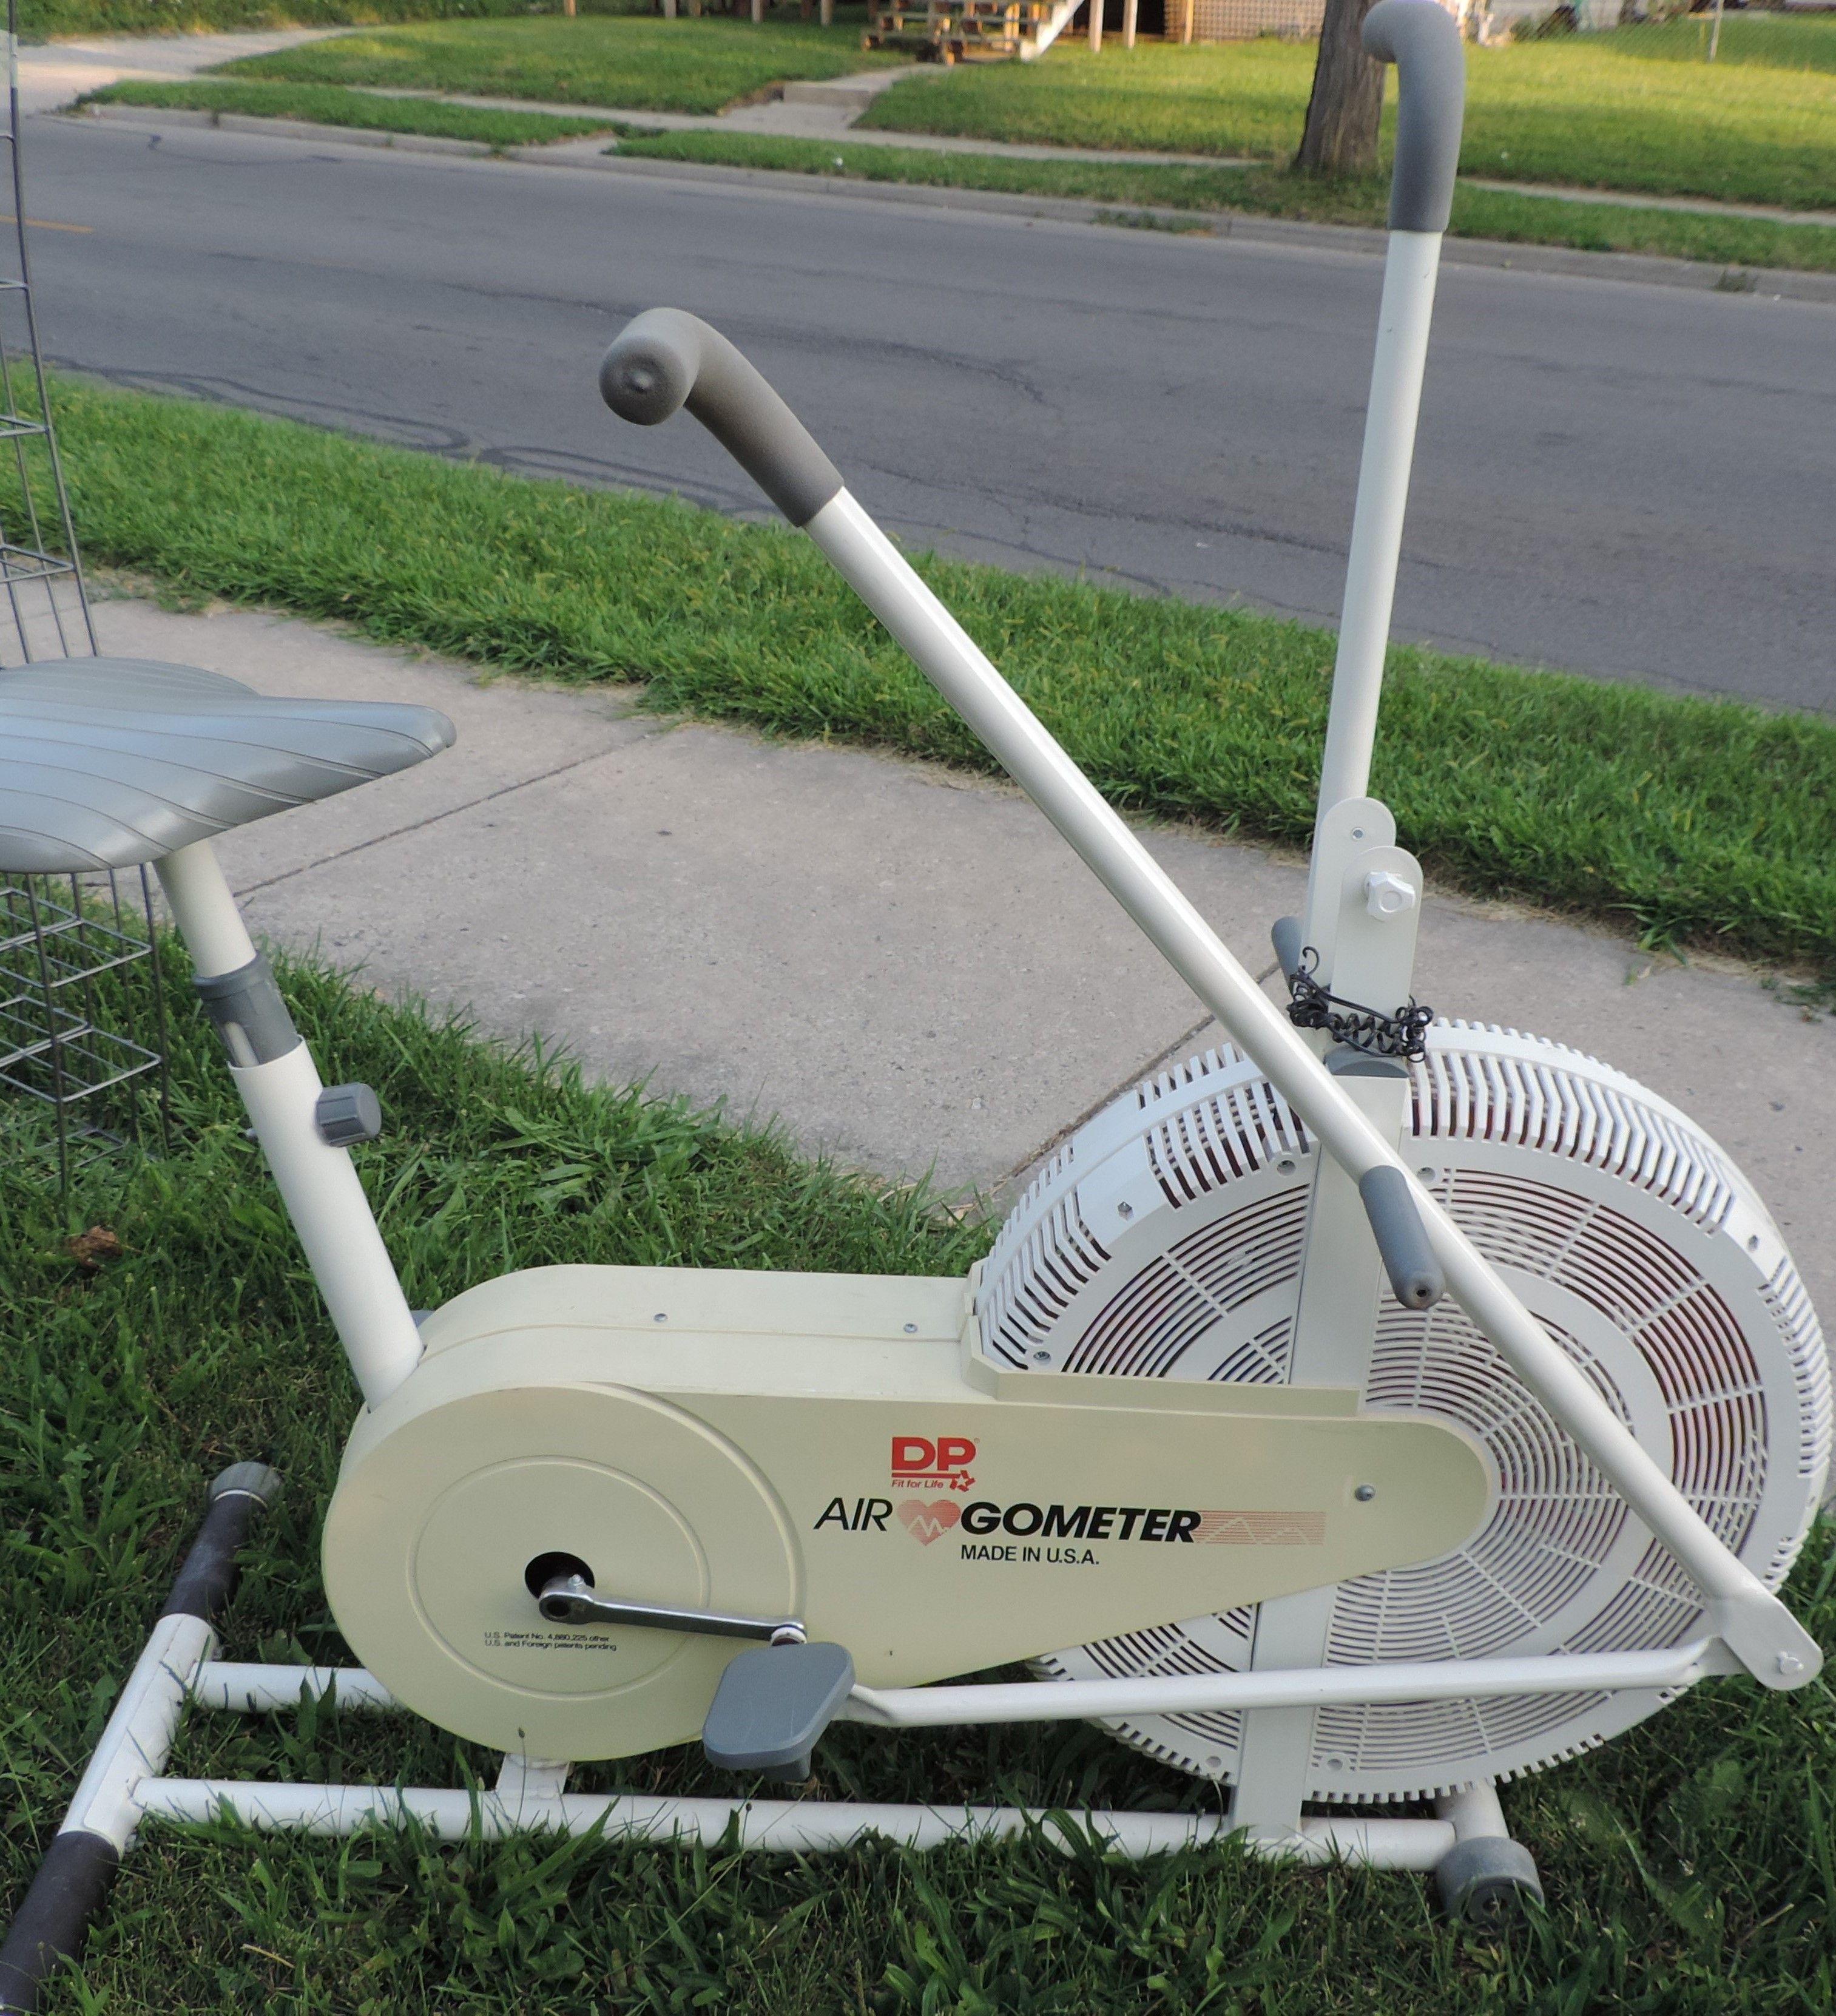 DP Airgometer Exercise Bicycle in Peas' Garage Sale Fort